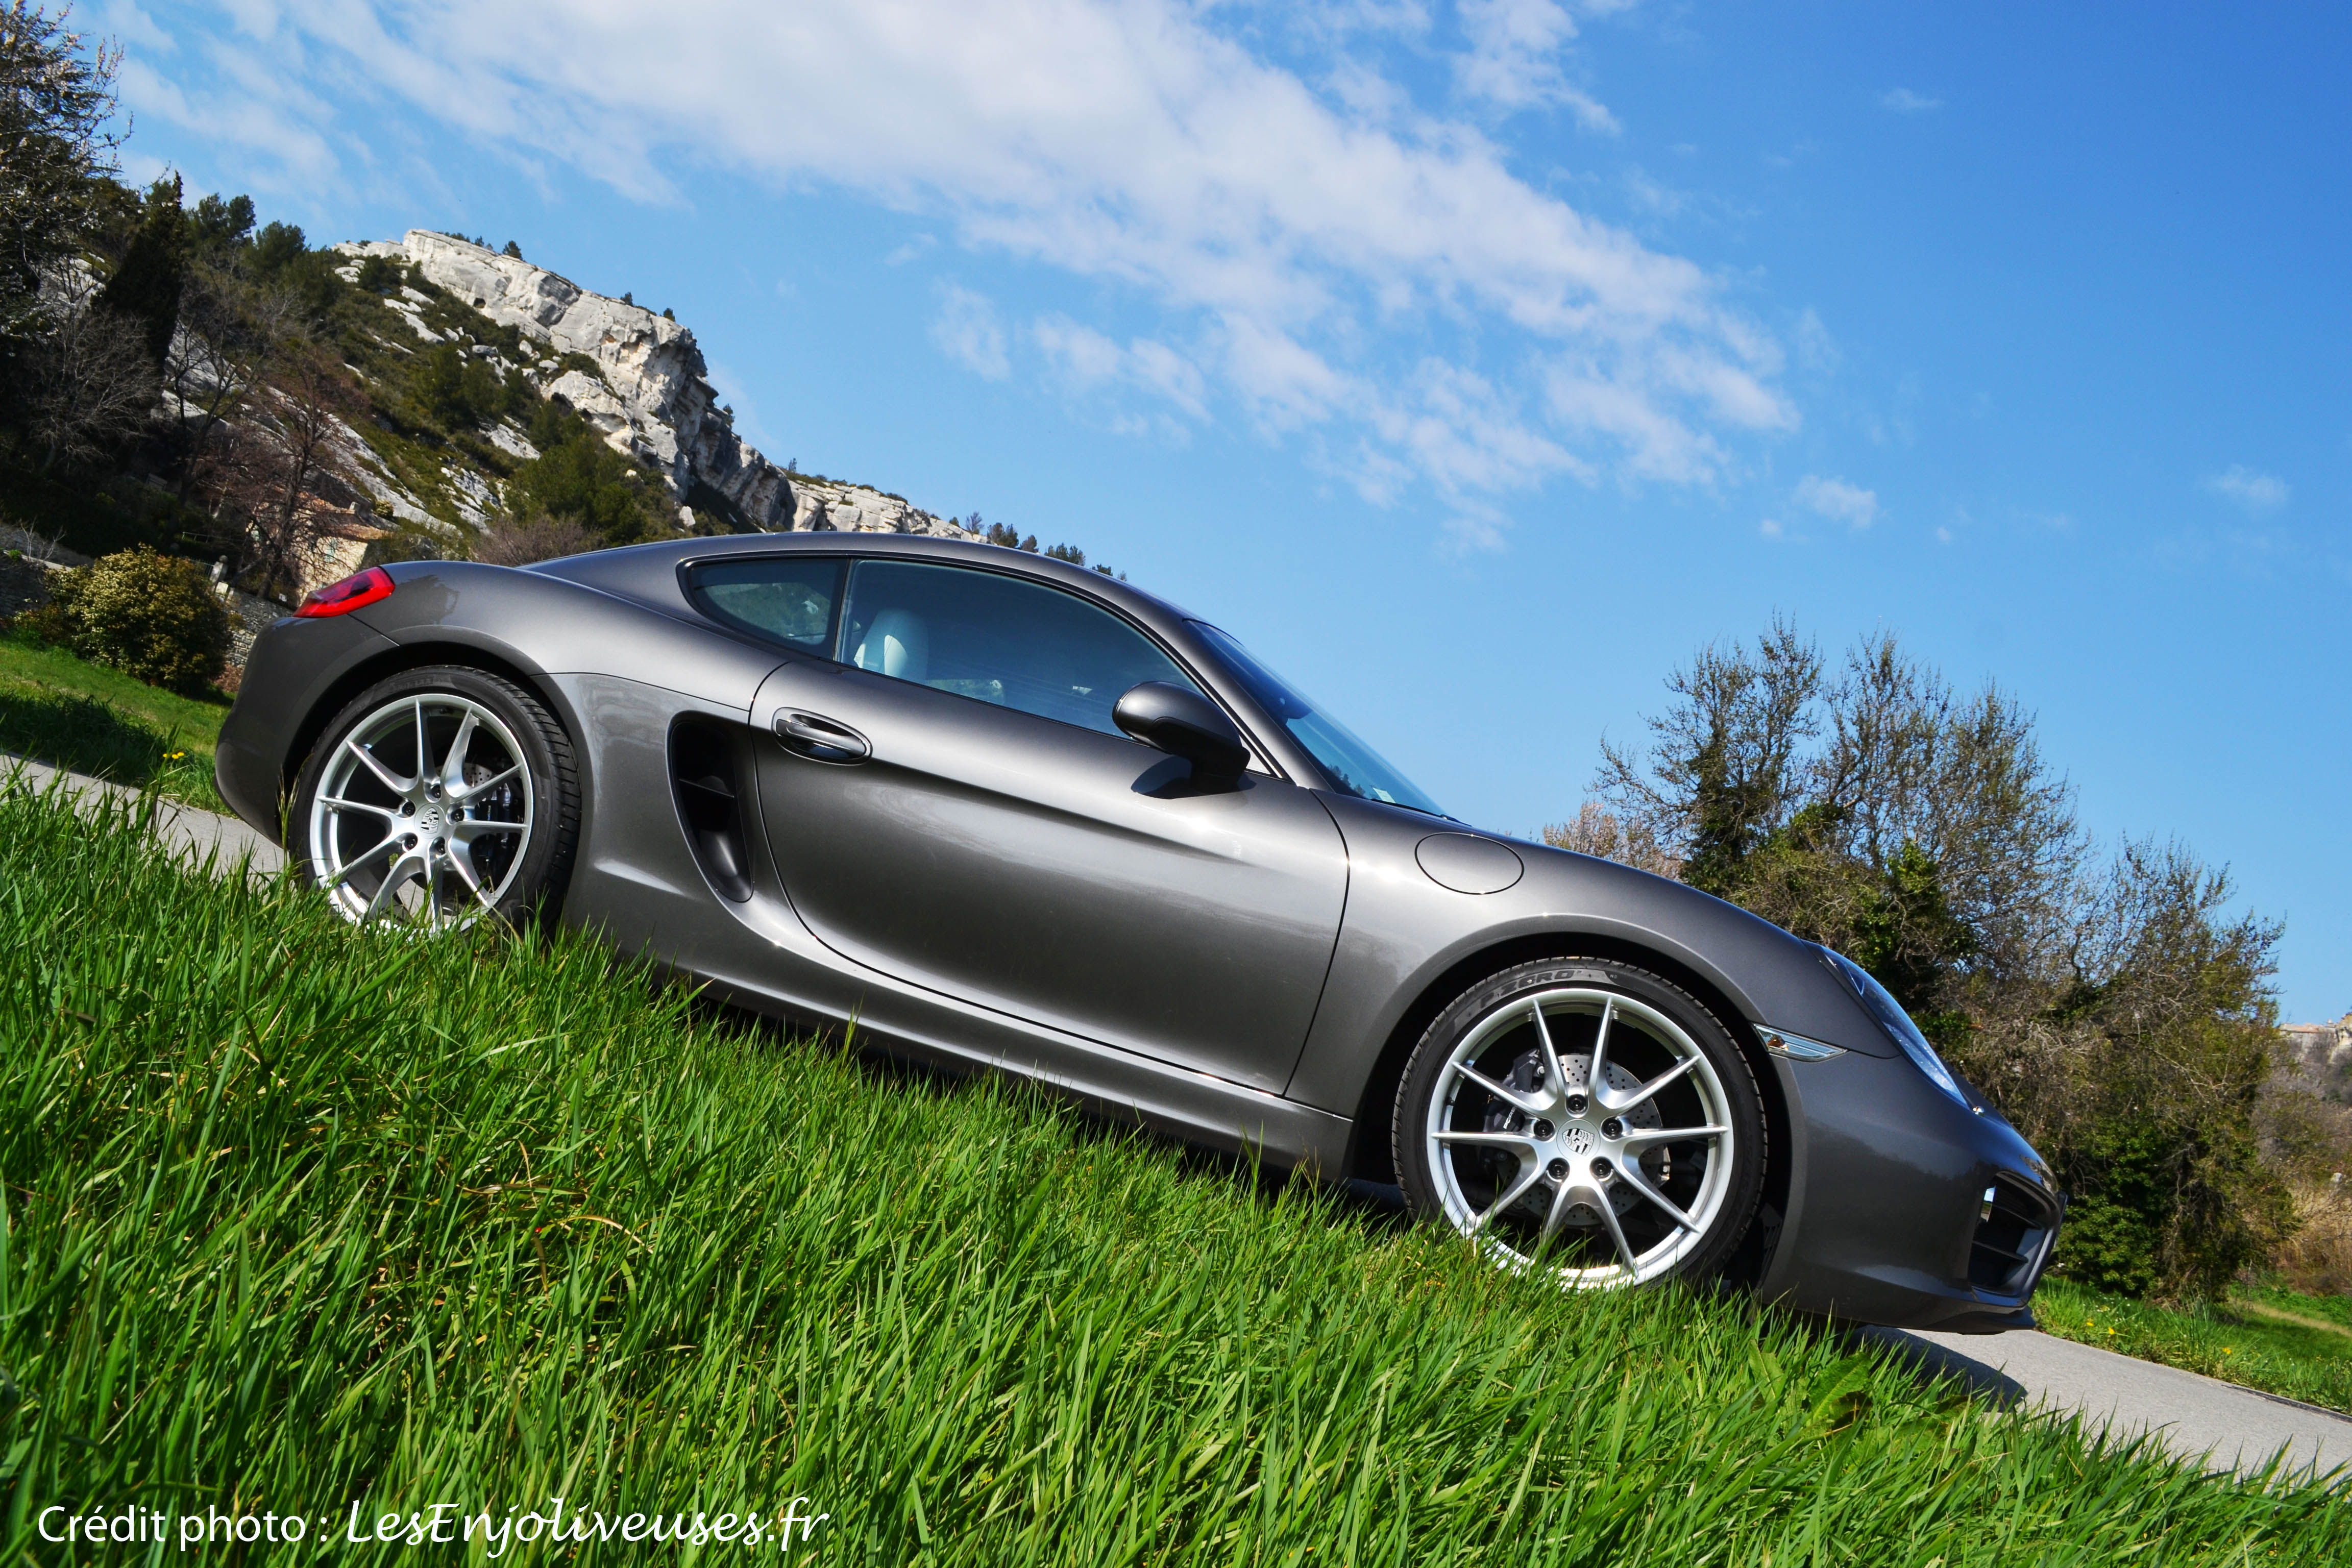 essai, nouveau, porsche Cayman, Porsche, Cayman, voiture femme, sportive, voiture sportive